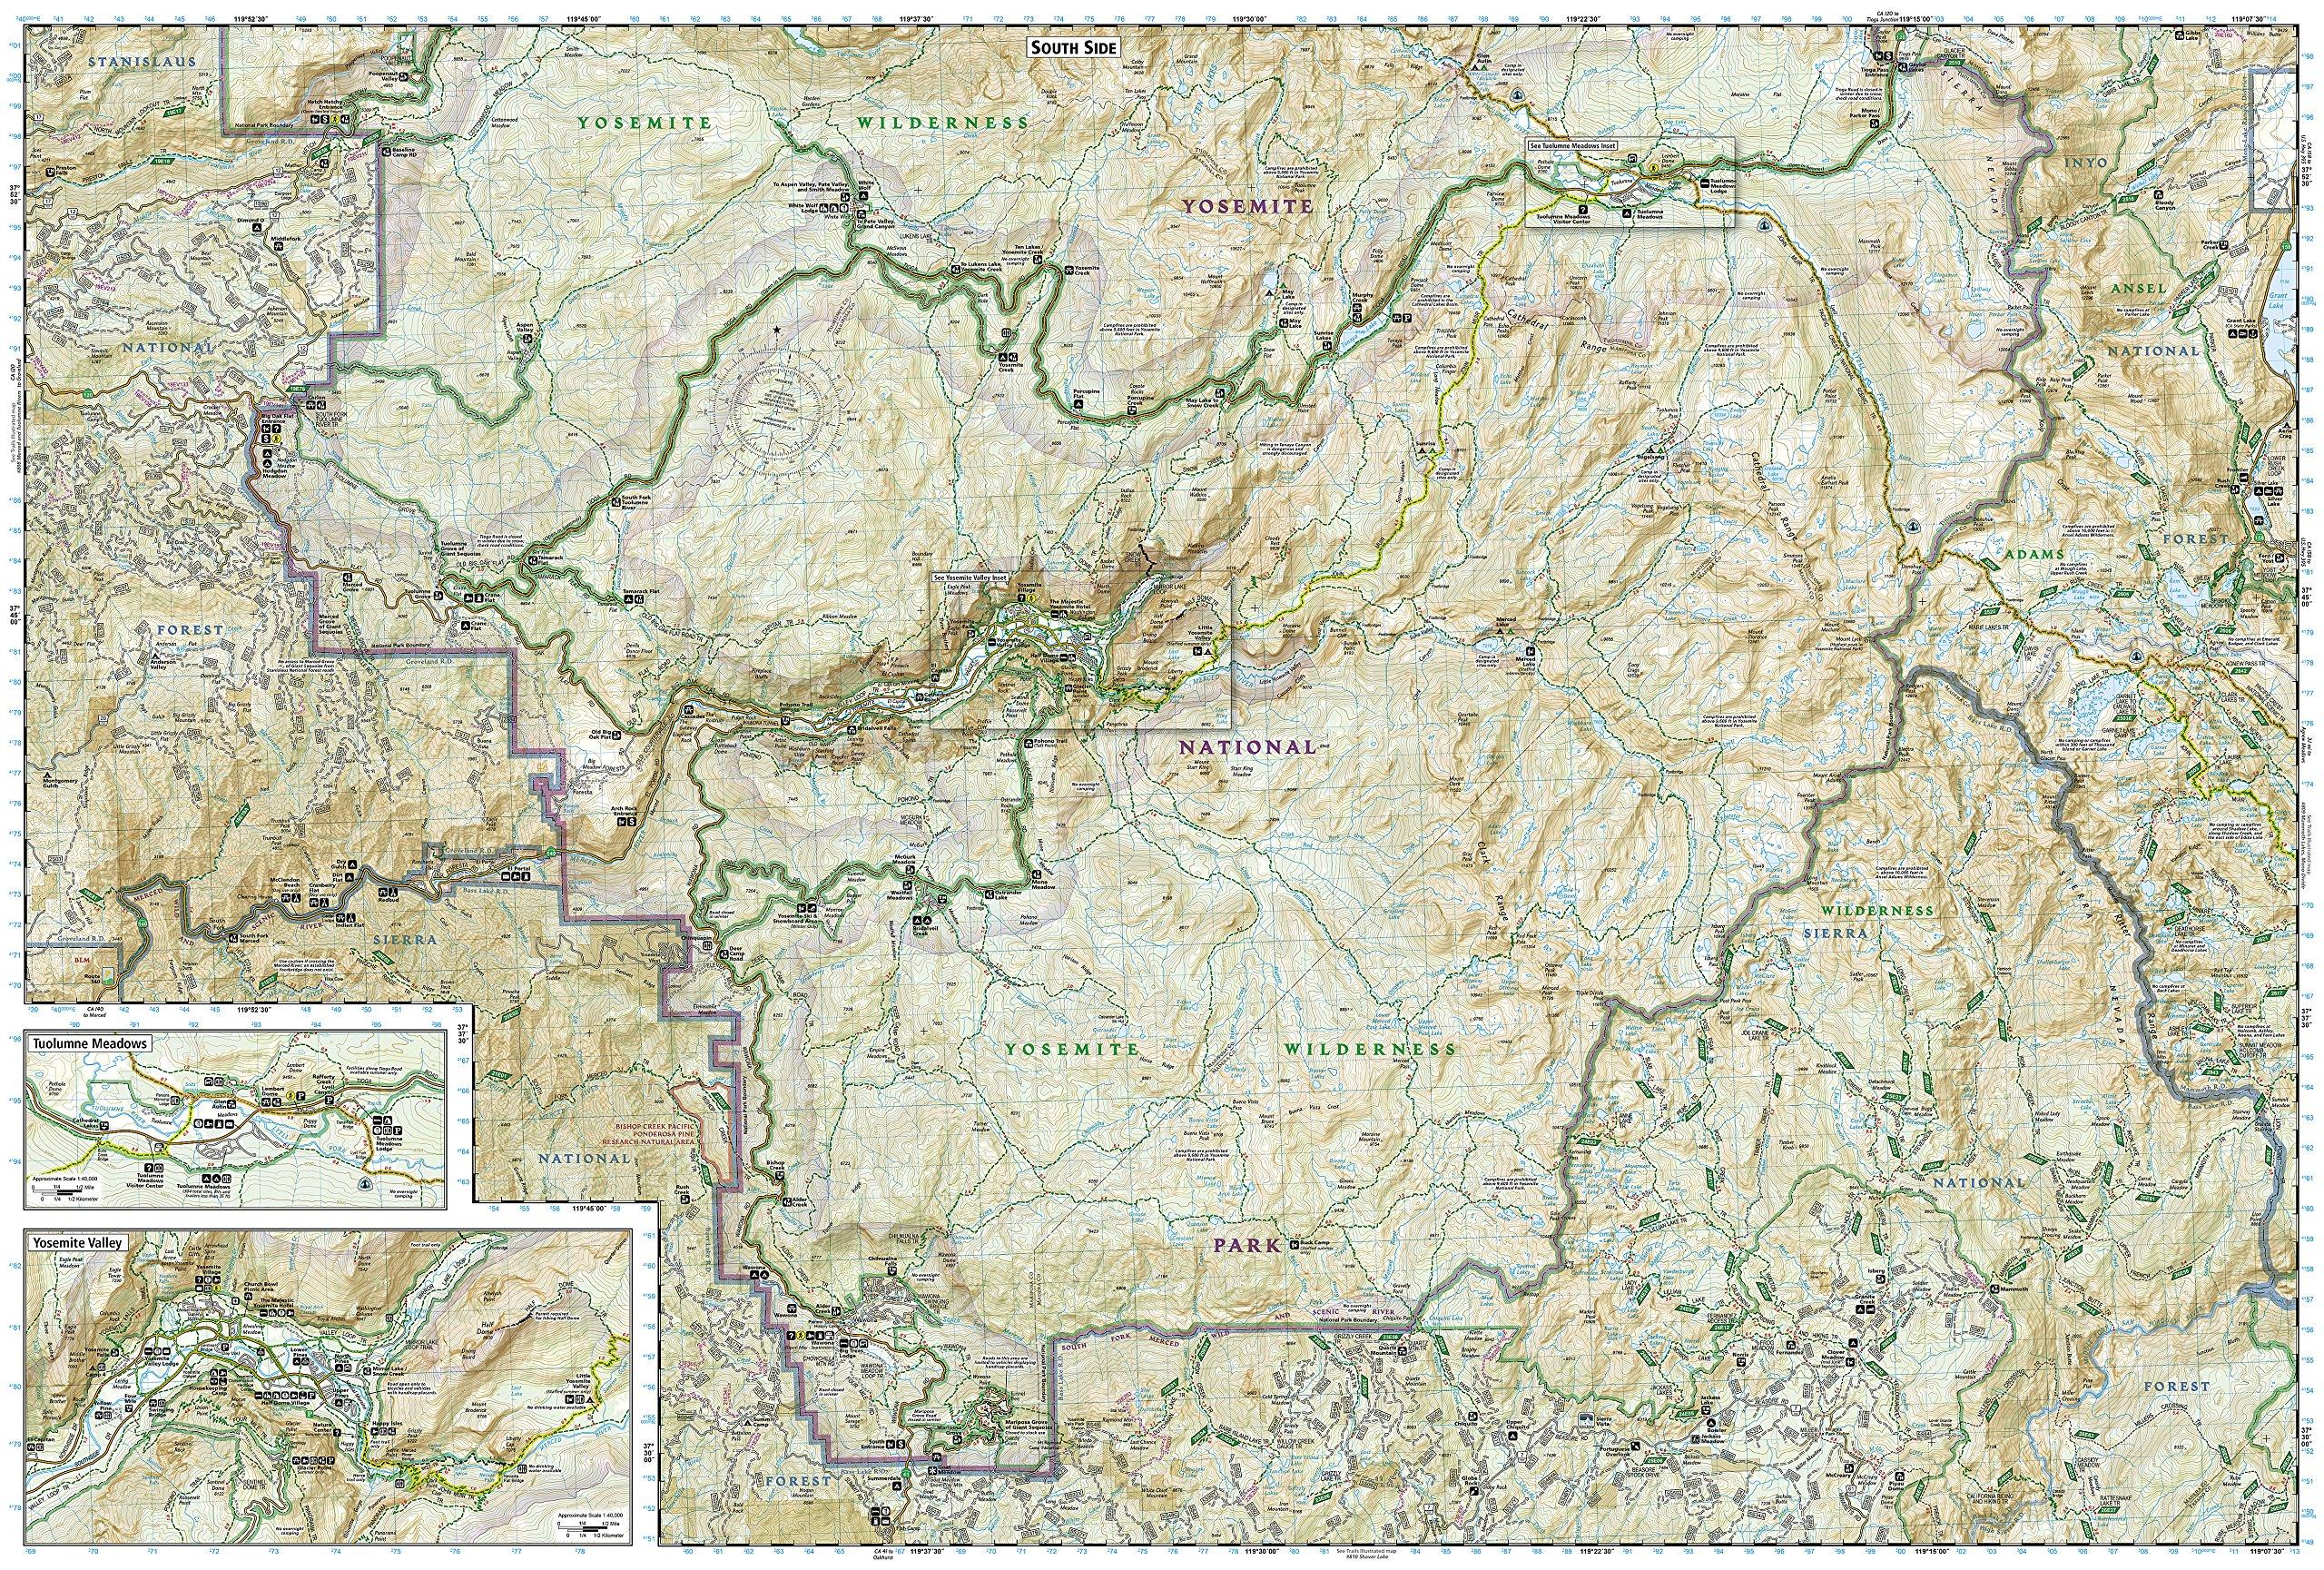 Yosemite National Park National Geographic Trails Ilrated Map National Geographic Maps Trails Ilrated 0749717012066 Amazon Com Books